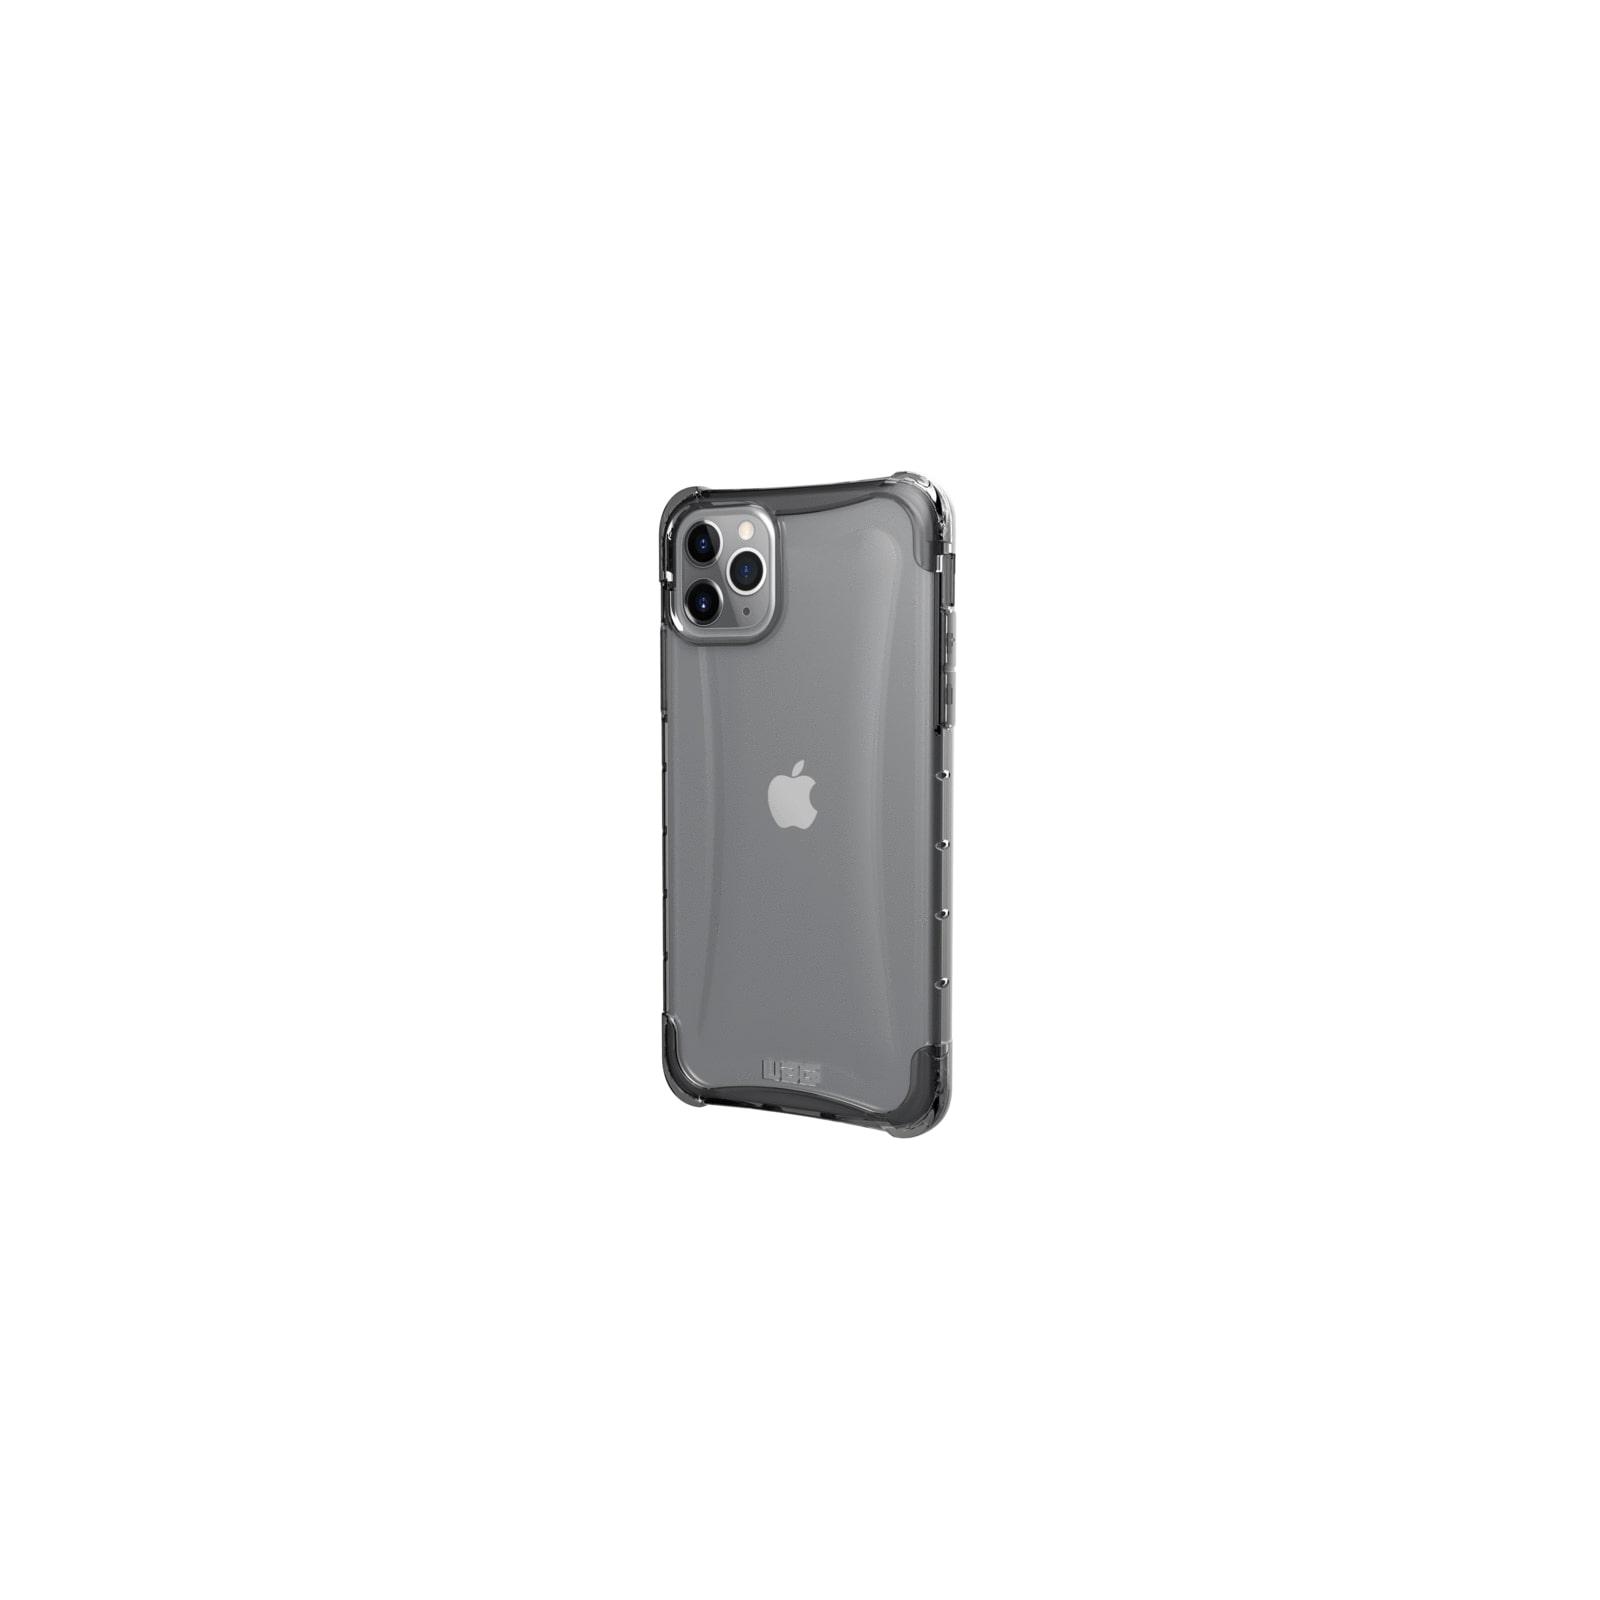 Чехол для моб. телефона Uag iPhone 11 Pro Max Plyo, Ice (111722114343) изображение 2